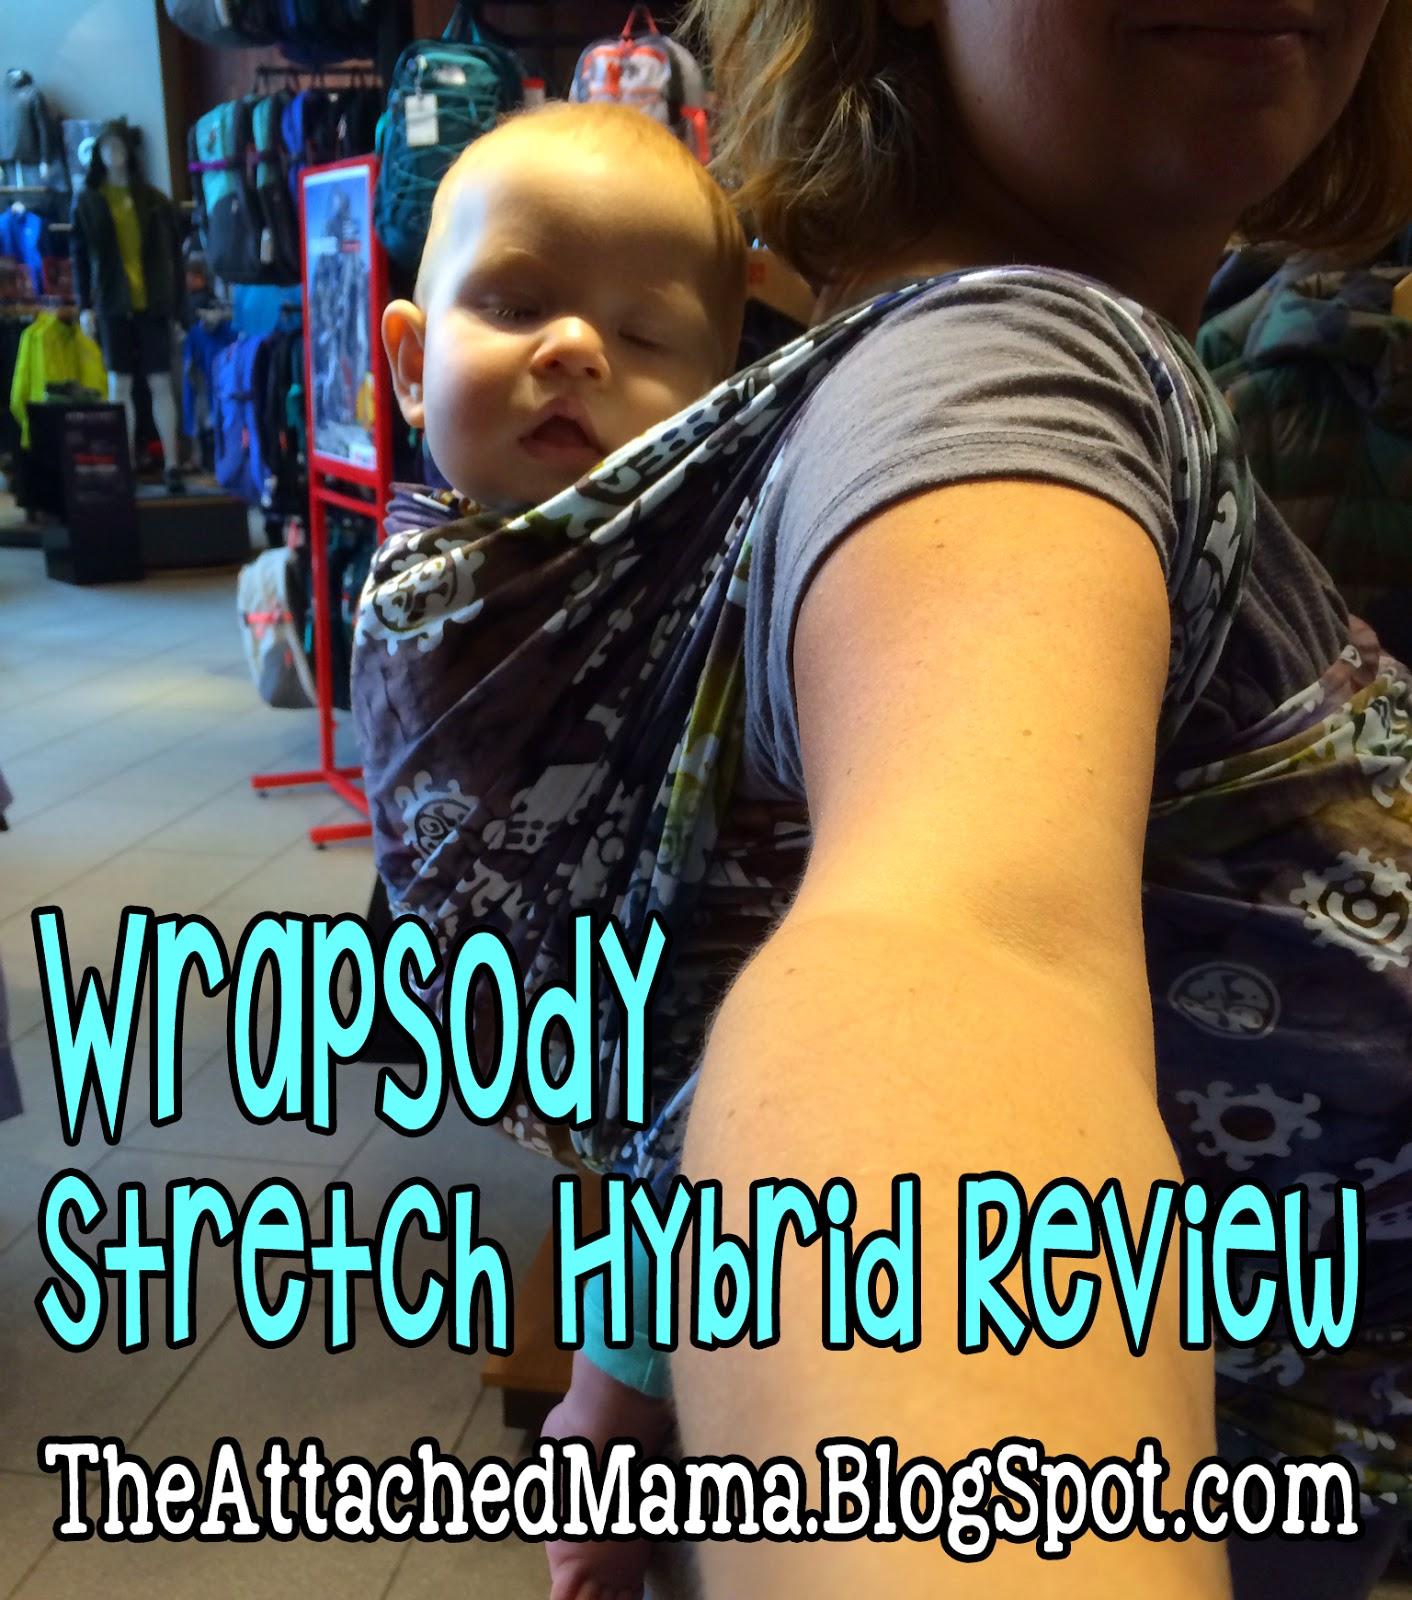 23efc8fdb3c The Attached Mama  Wrapsody Stretch-Hybrid Review